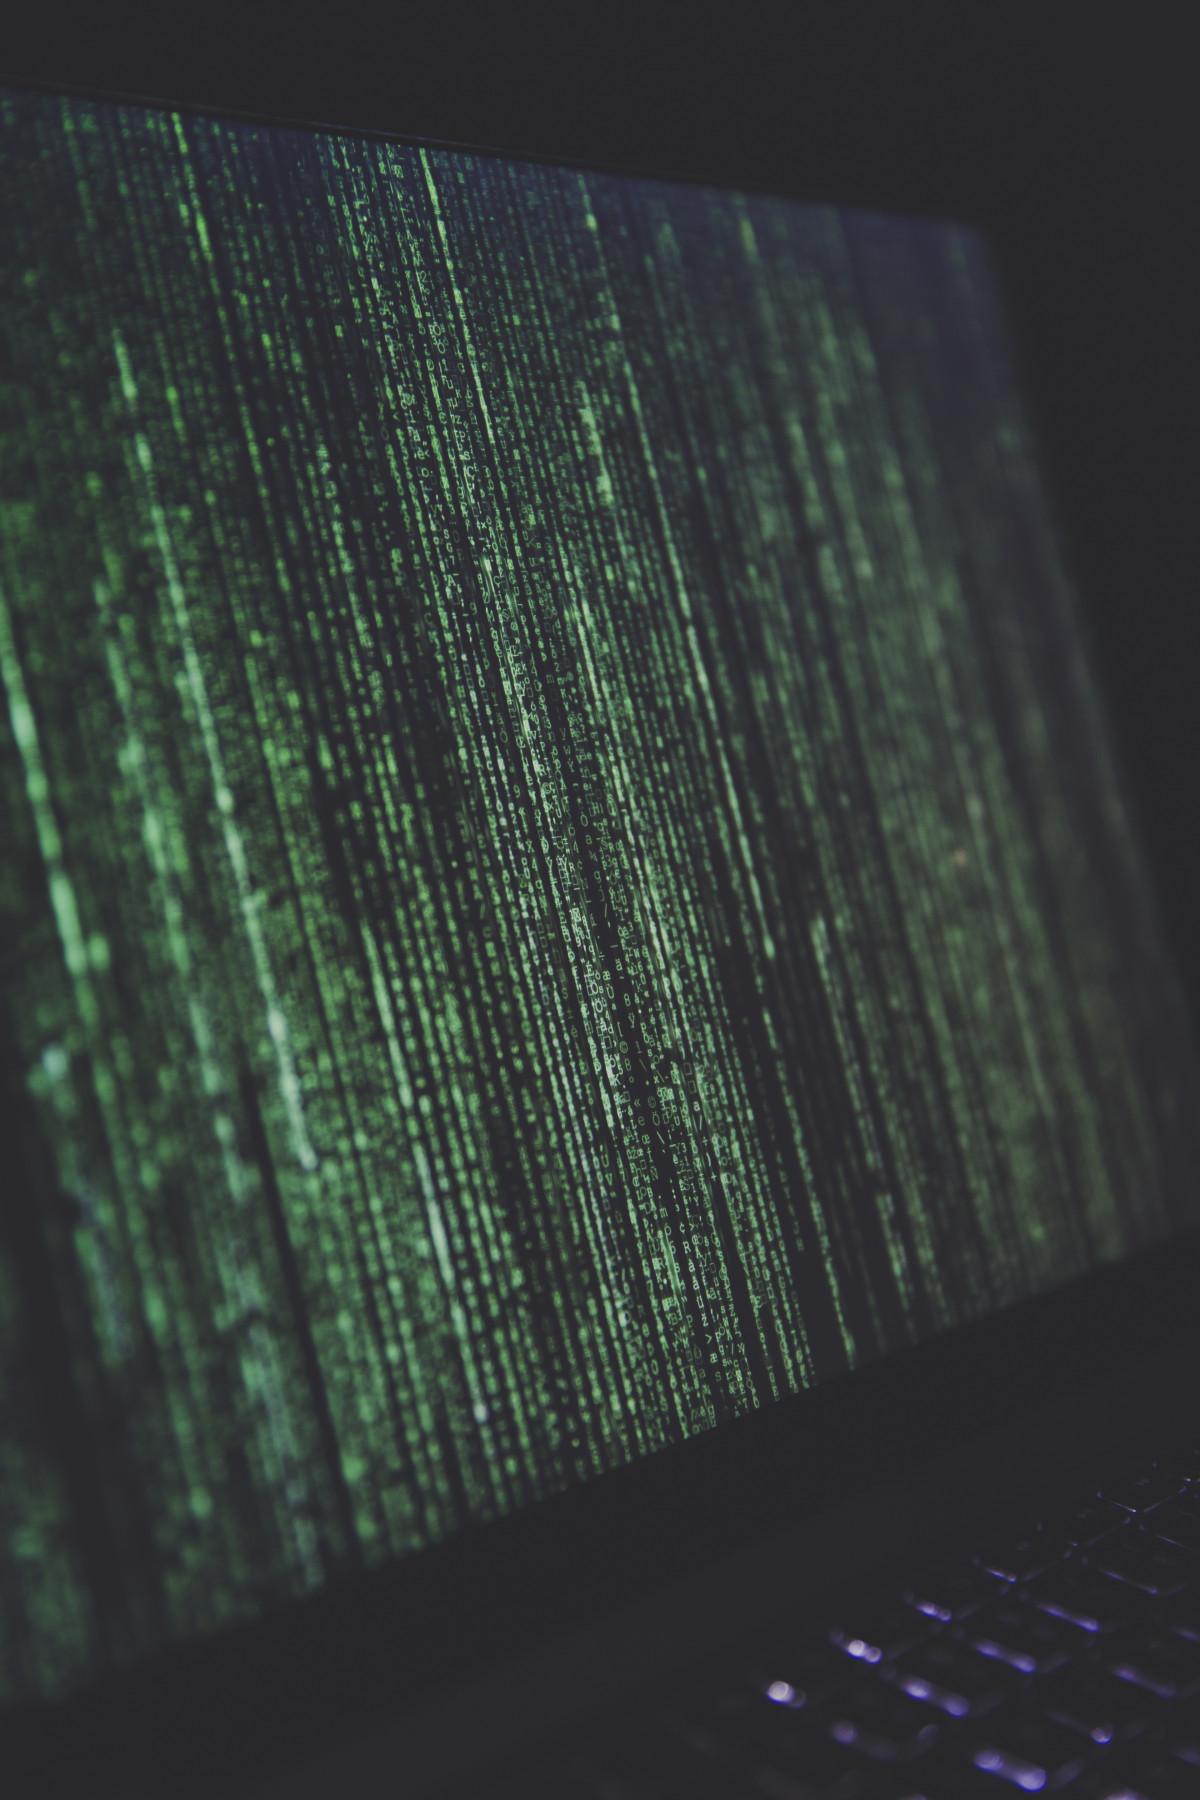 free images : computer, hand, screen, internet, finger, lens